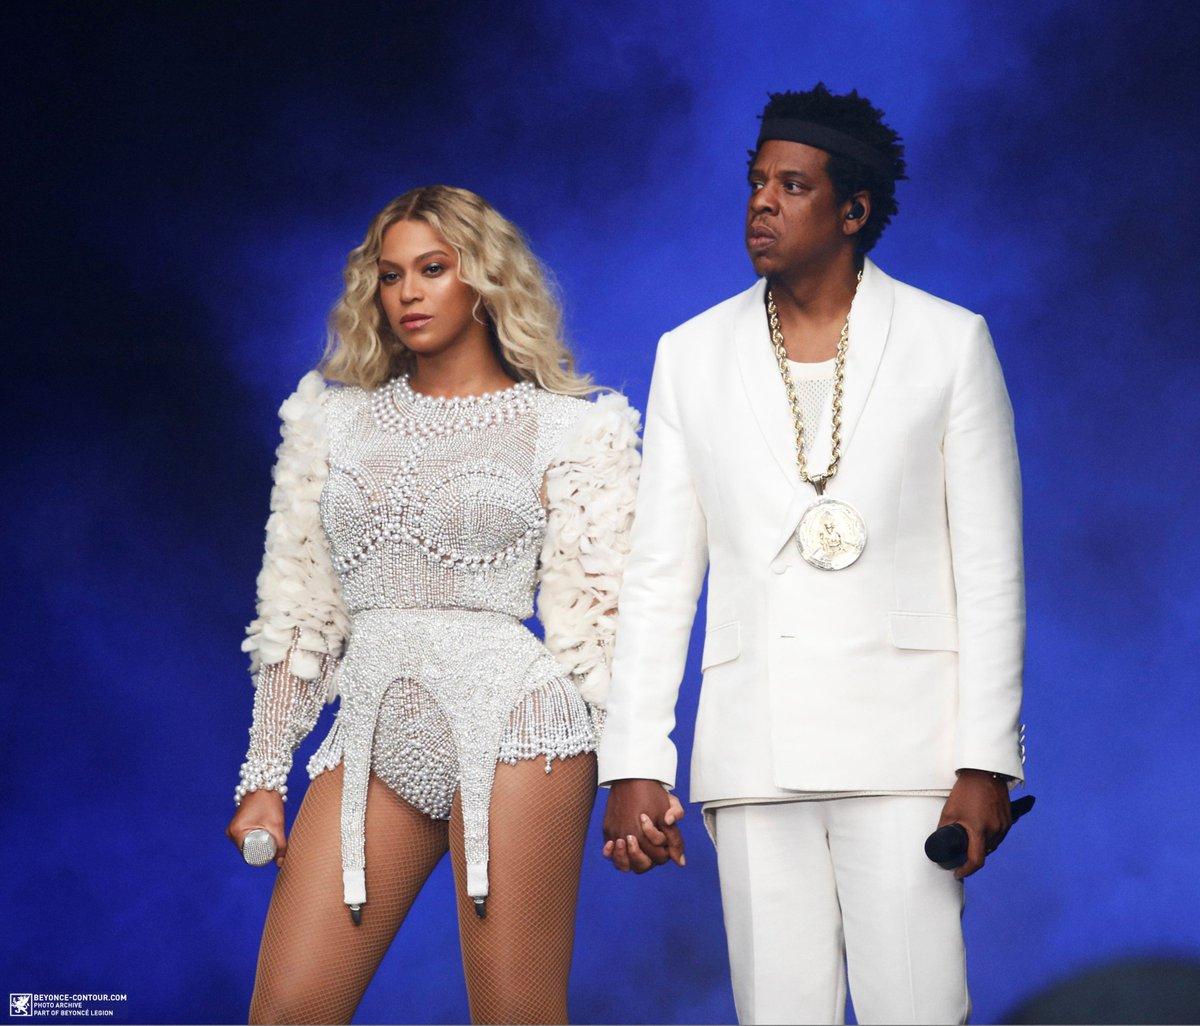 Beyoncé &amp; JAY-Z performing in Paris — July 14th. #OTRII   http:// bit.ly/2zBDRDq  &nbsp;  <br>http://pic.twitter.com/NQjYLmYb2E